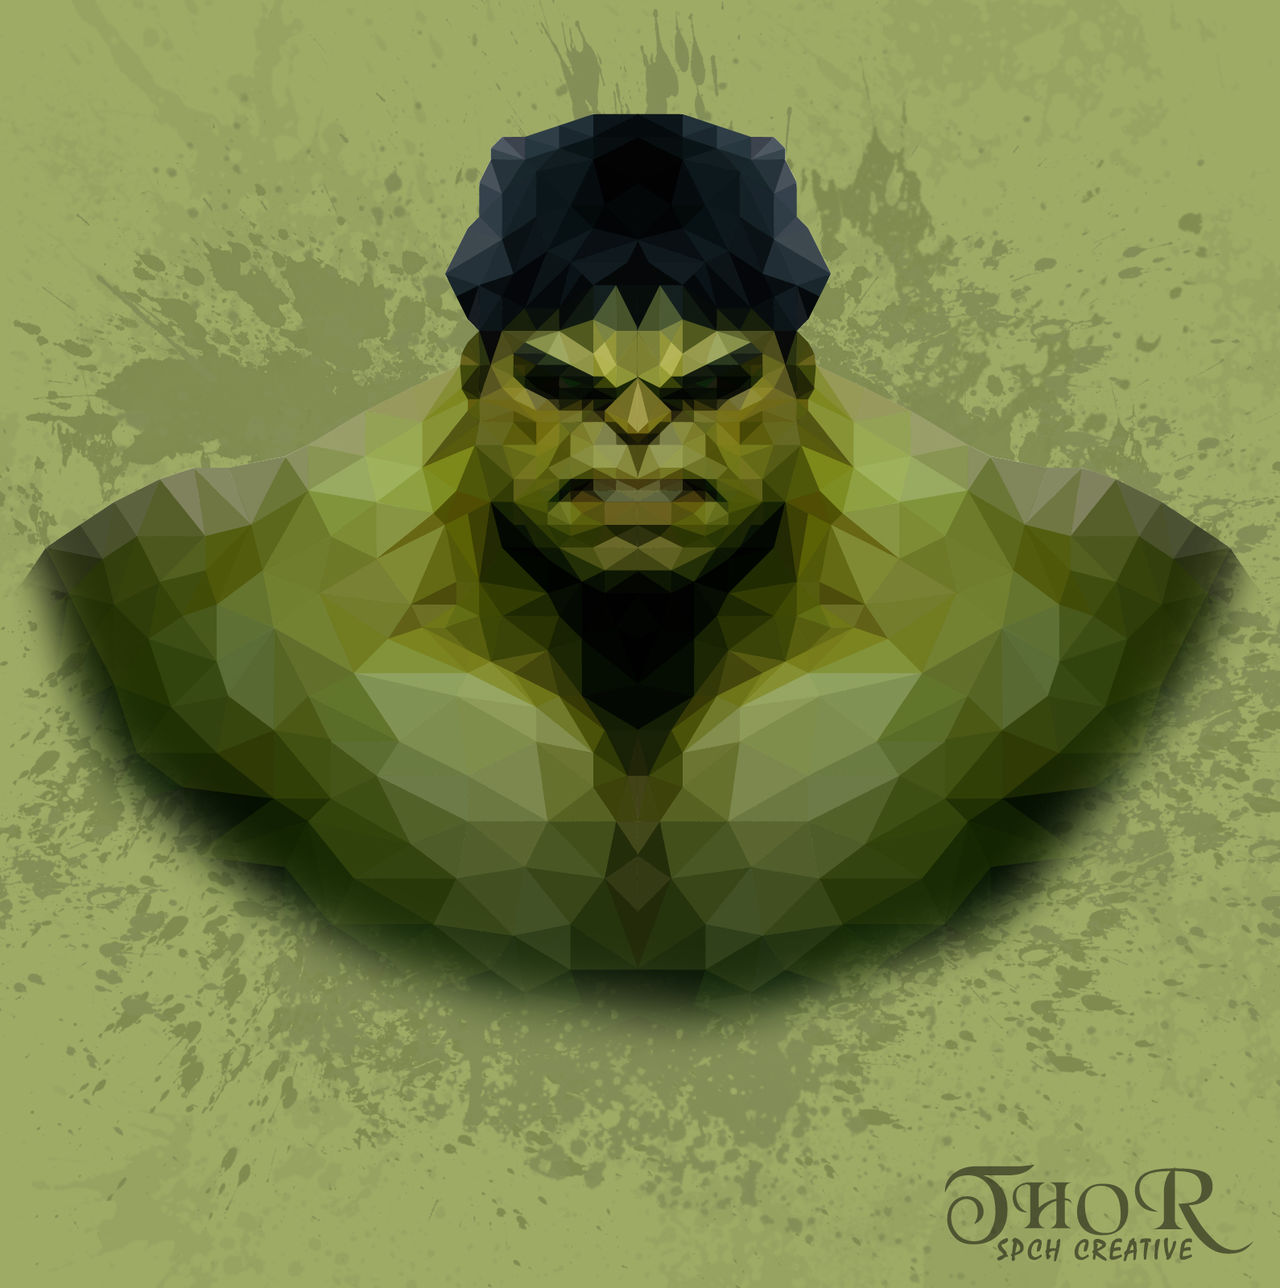 Buengkan Hulk Photo Photos Picture SPCHcreative Thailand Thailand_allshots Thor